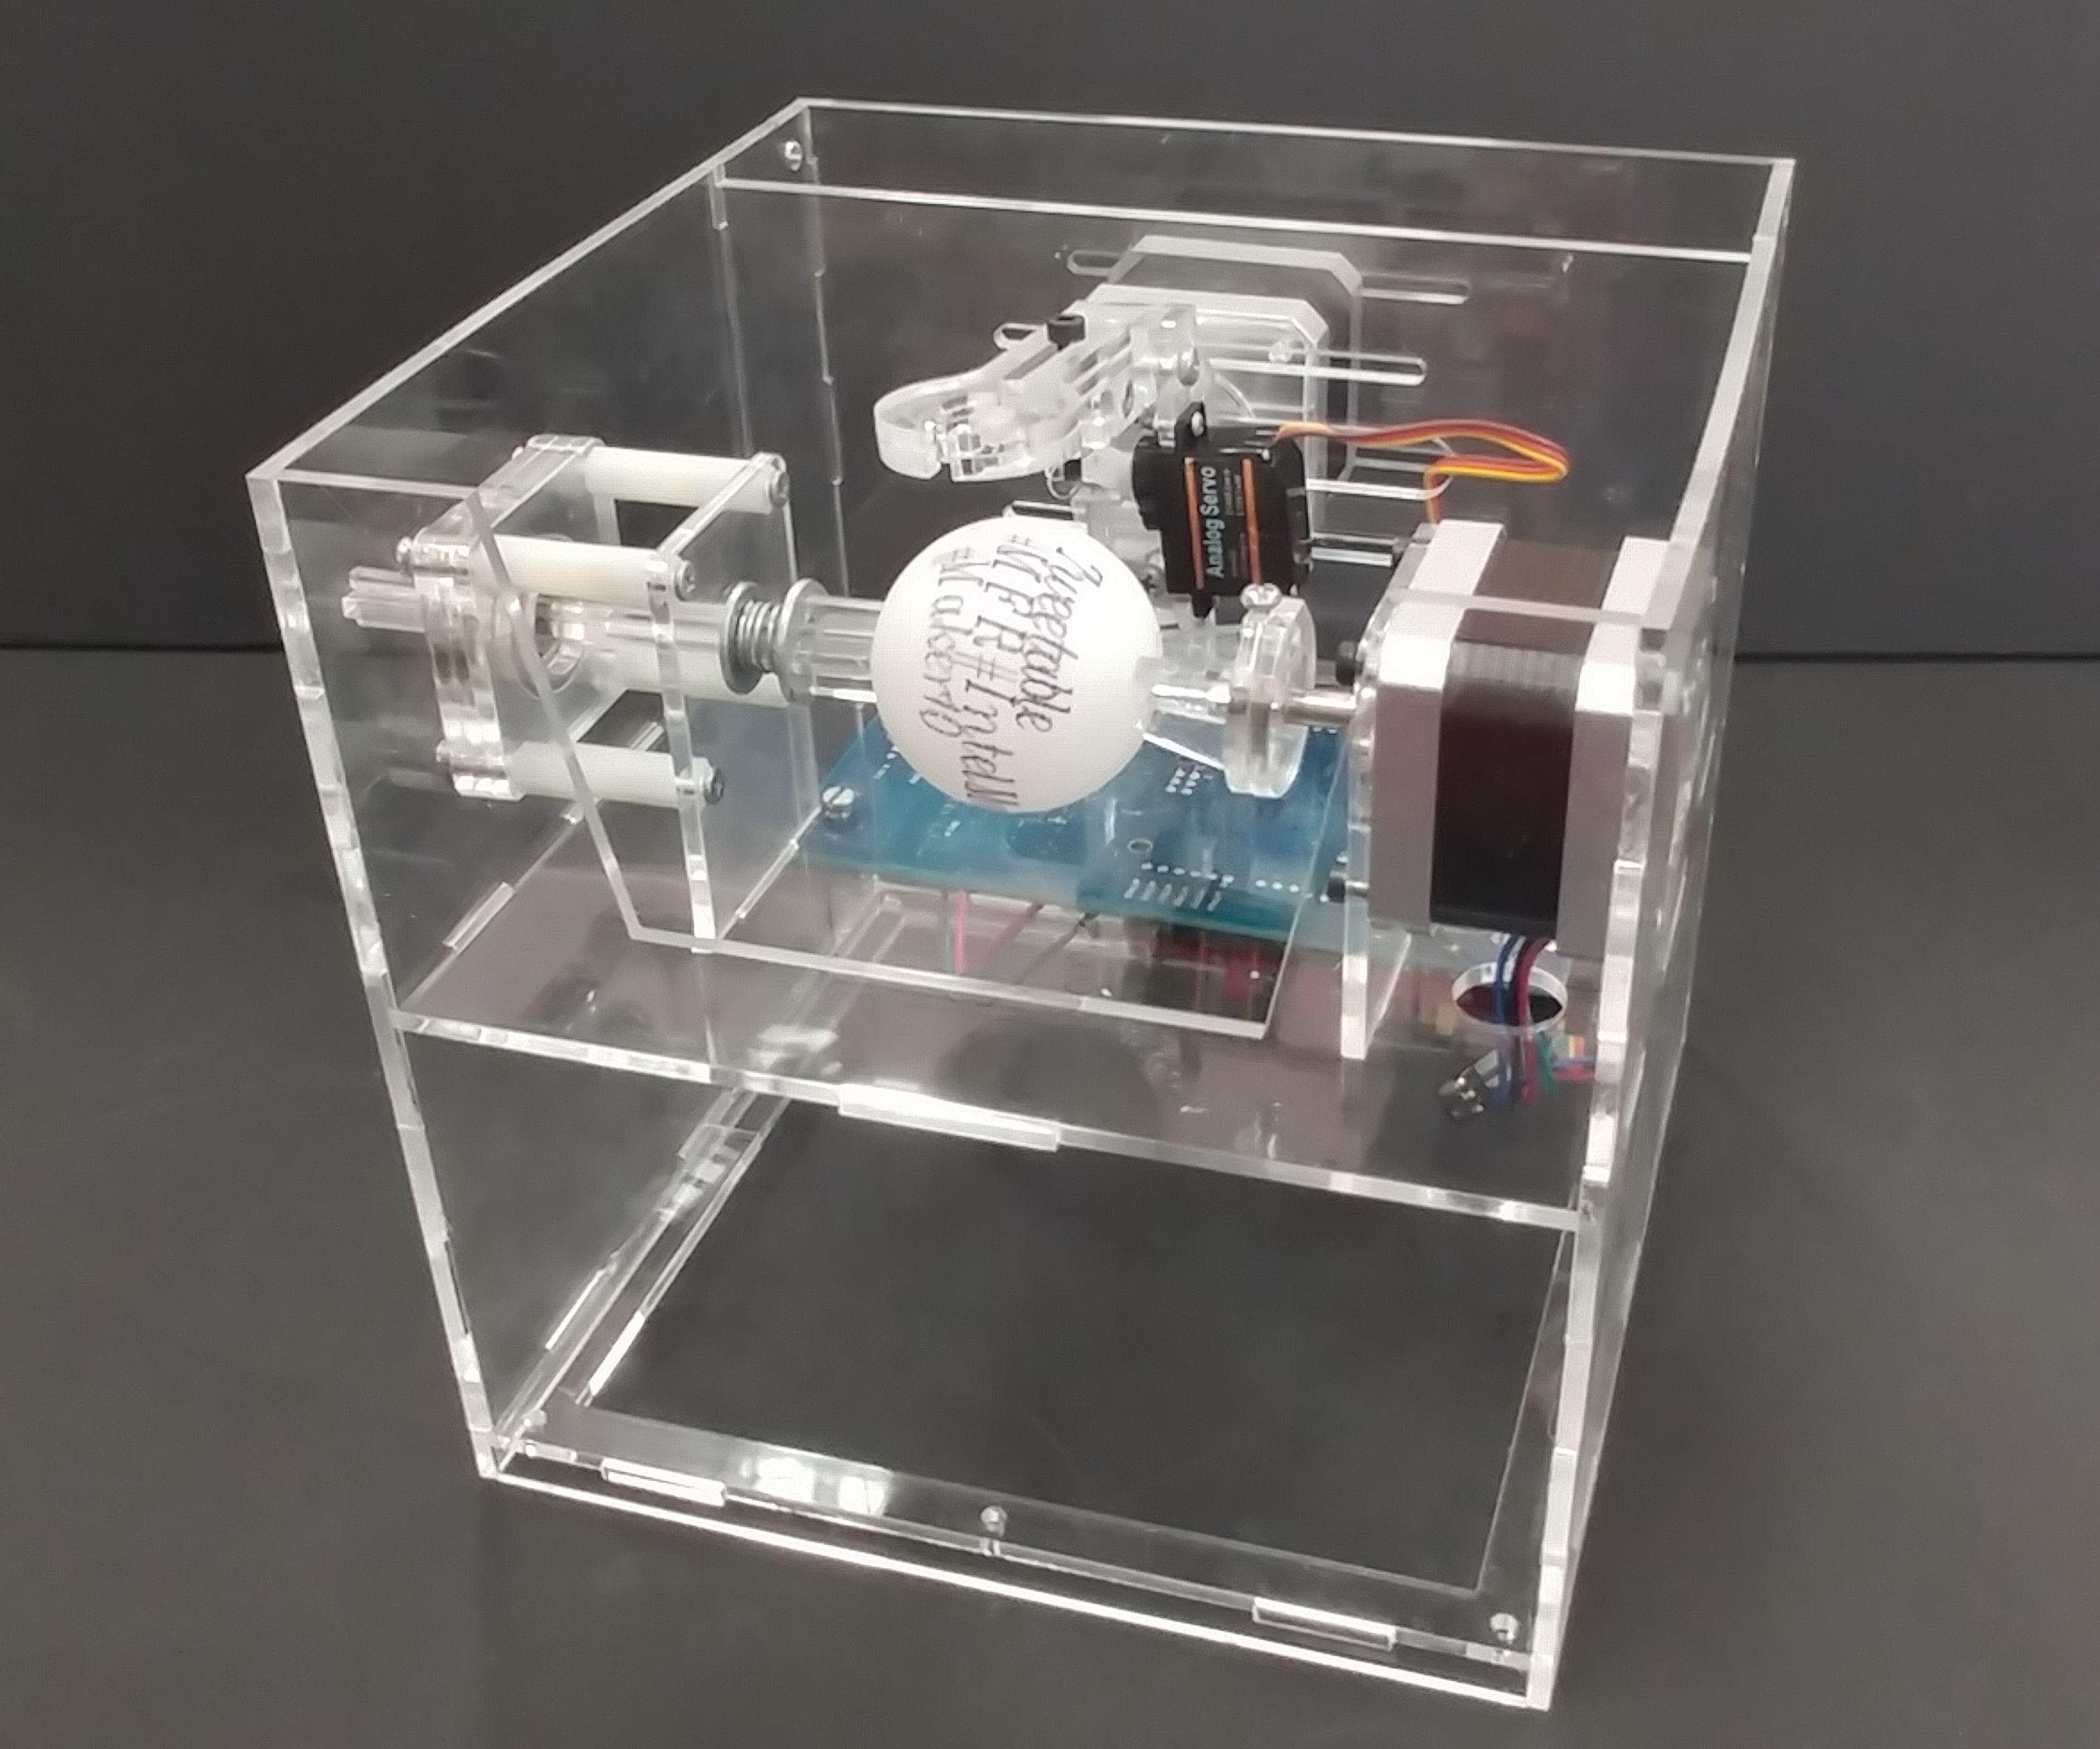 IntelMaker - Tweet A Ball (TaB)